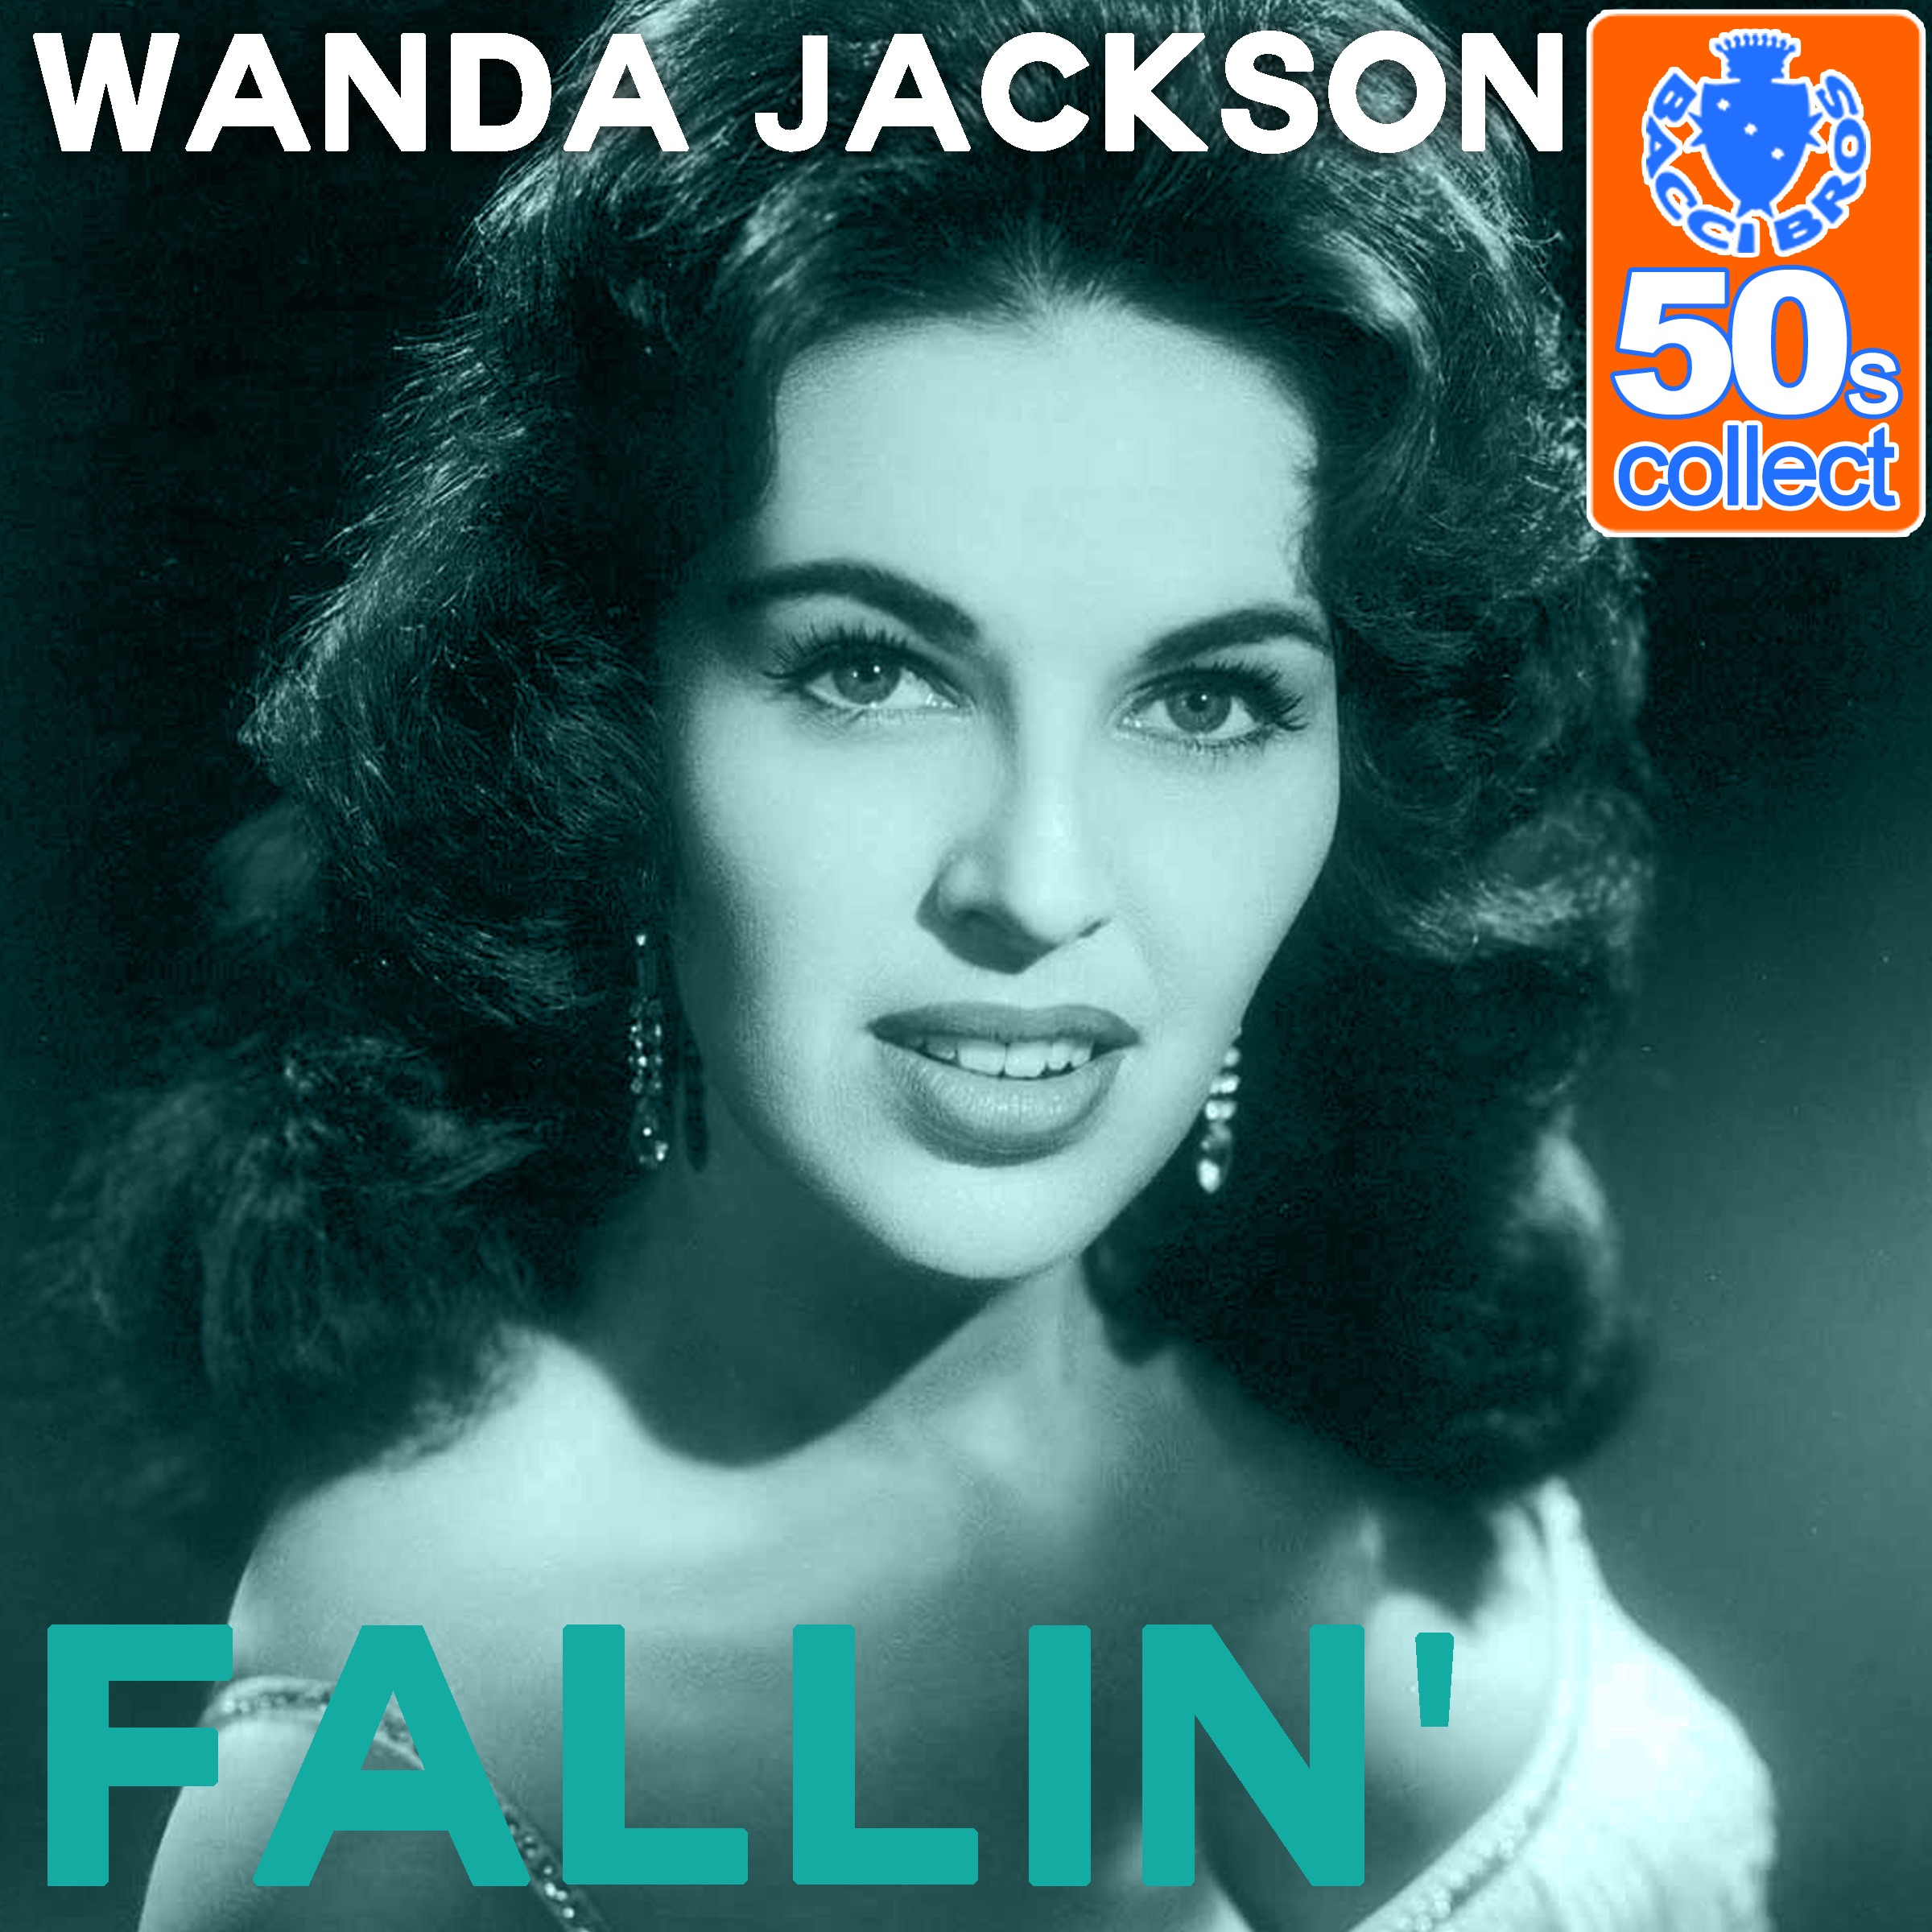 Fallin' (Remastered) - Single